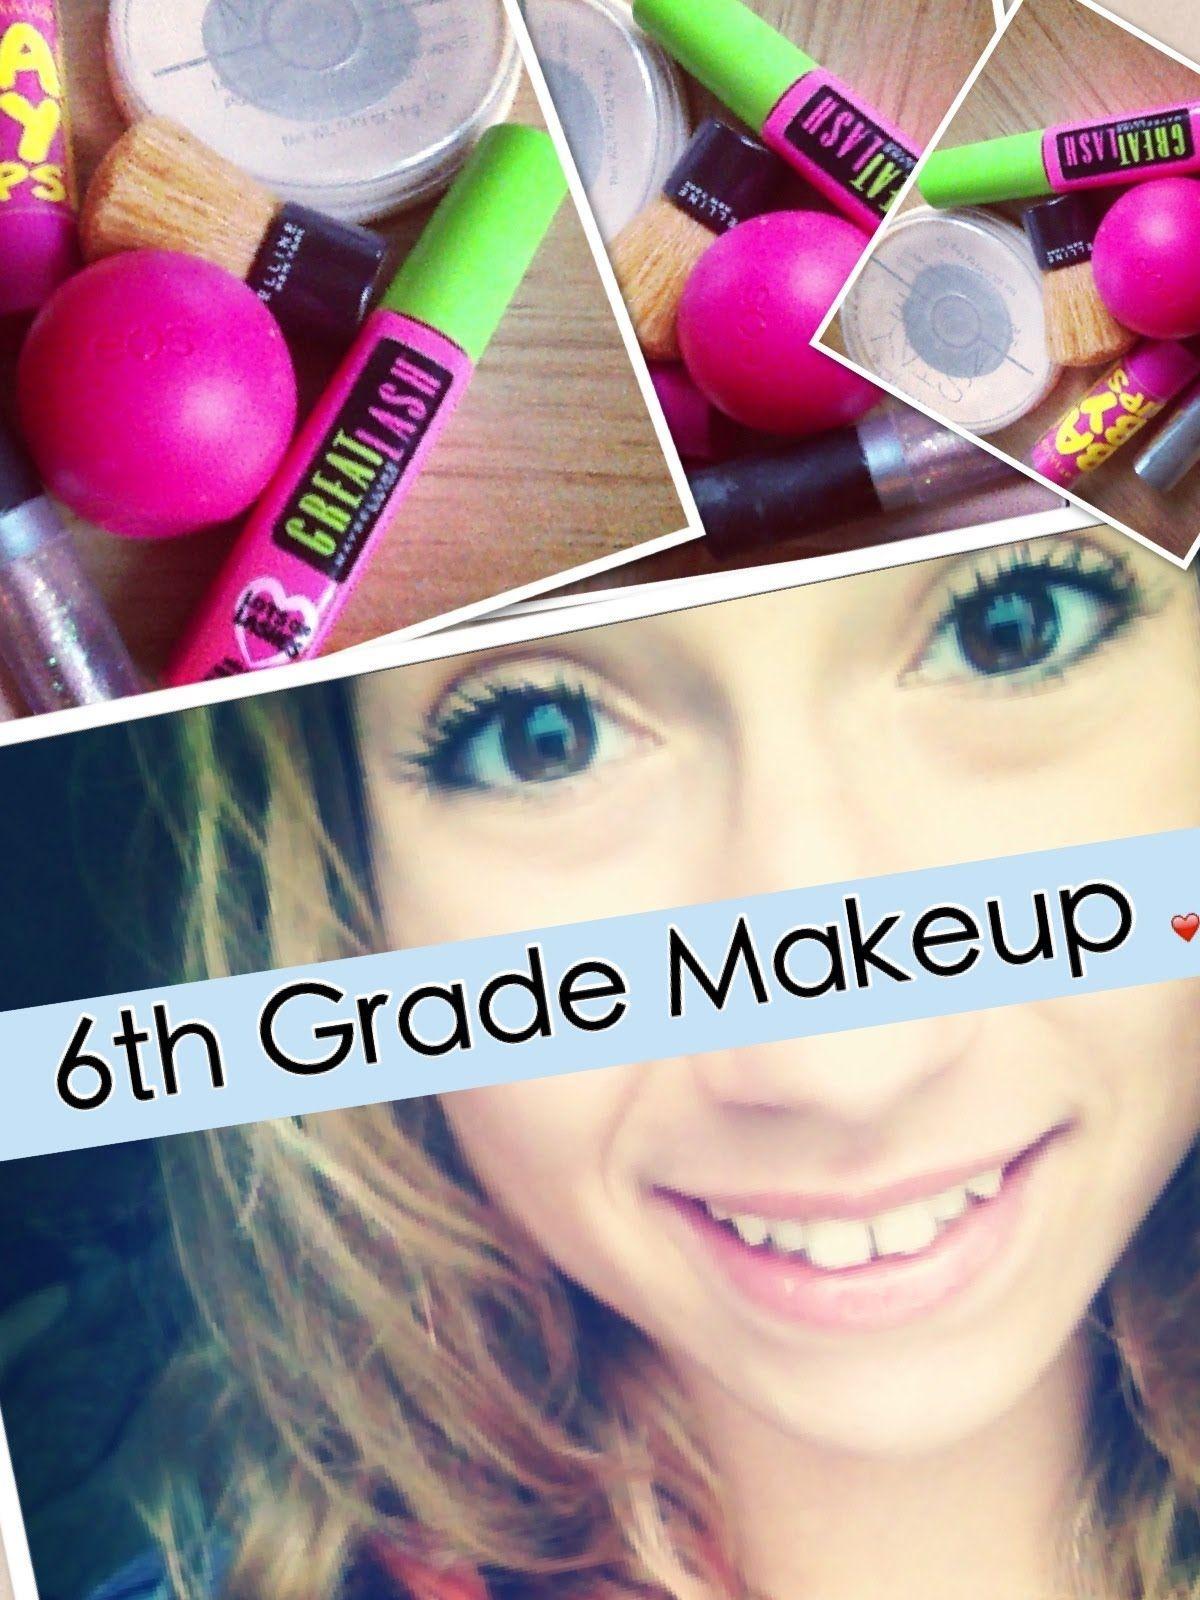 Back to School 6th Grade Makeup Tutorial 2013 ! School